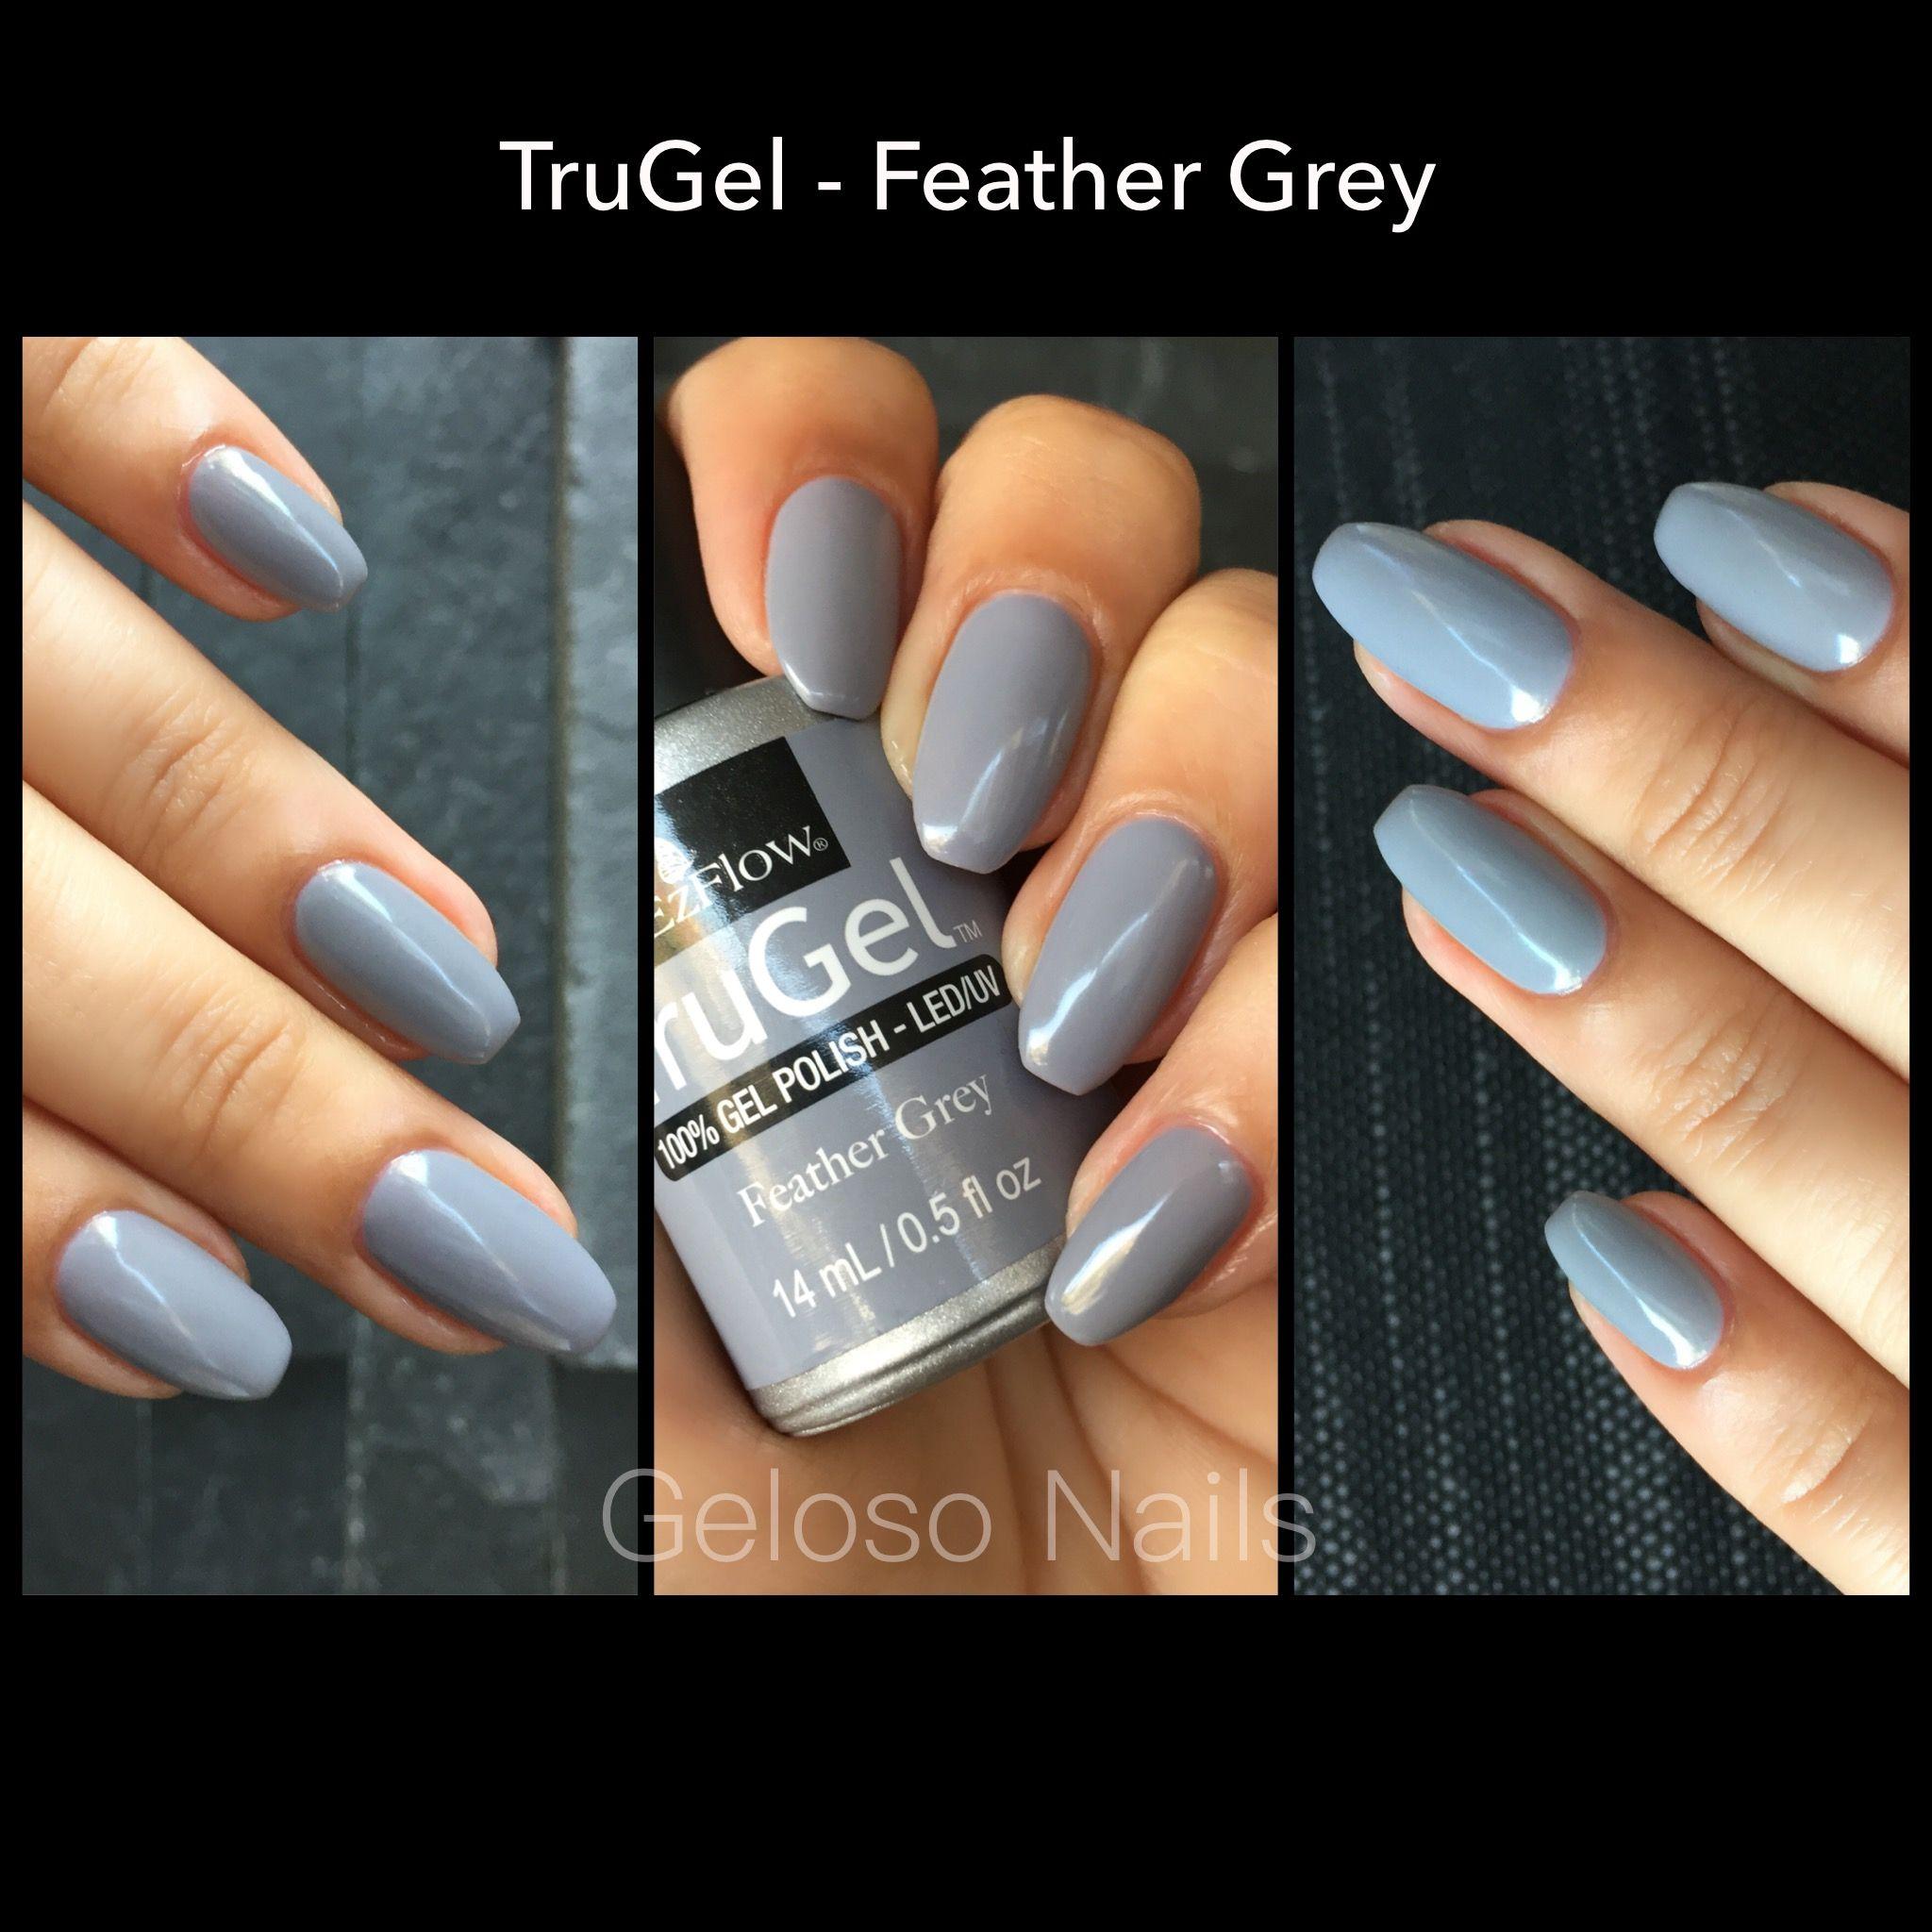 Ezflow TruGel Feather Grey | Nails | Pinterest | Swatch